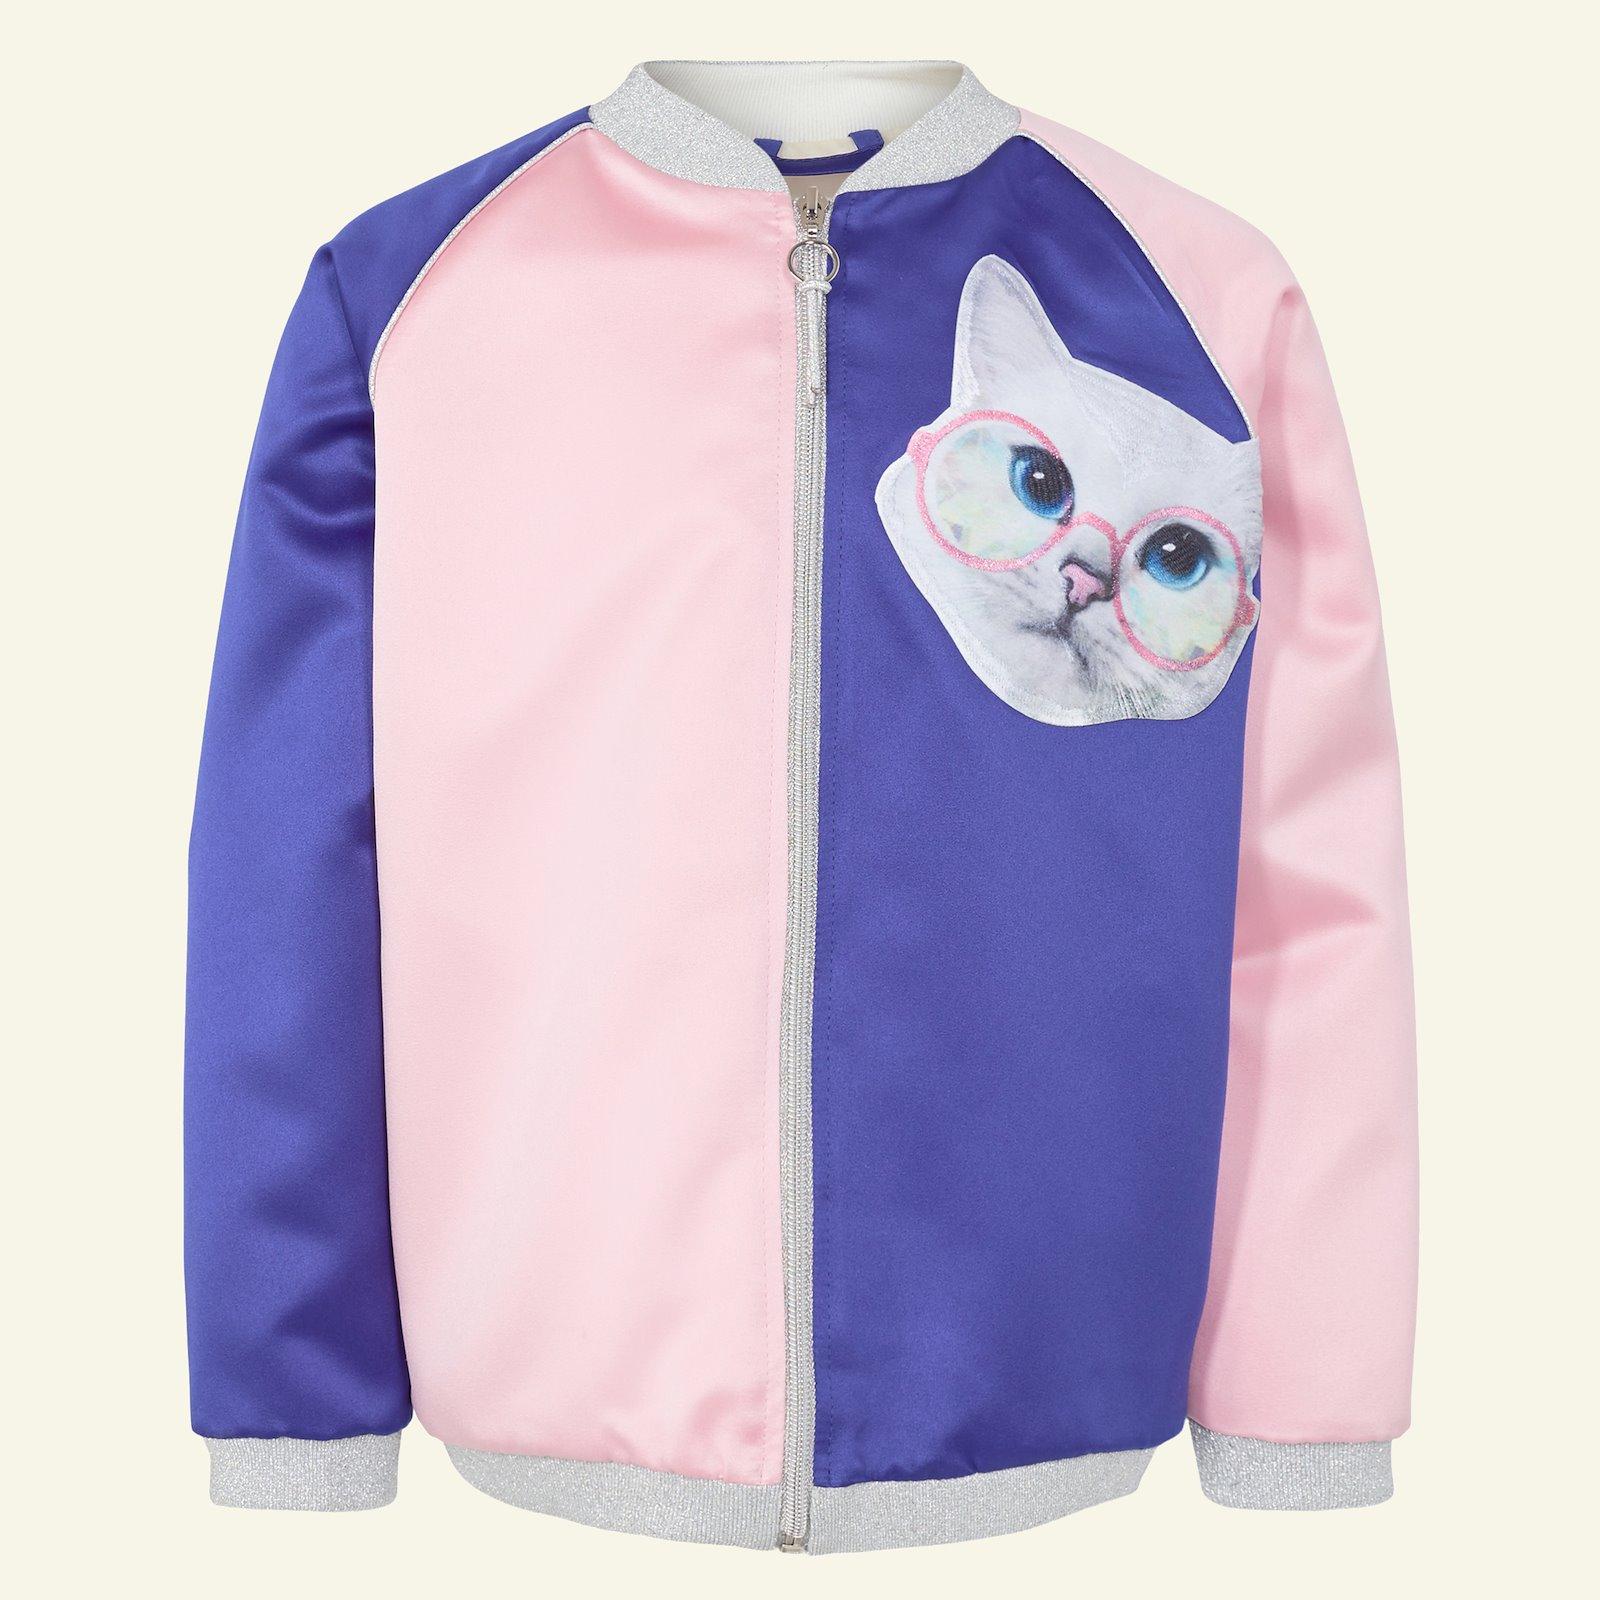 Bomber jacket, 134/9y p64017_620417_620094_96111_72078_26436_sskit